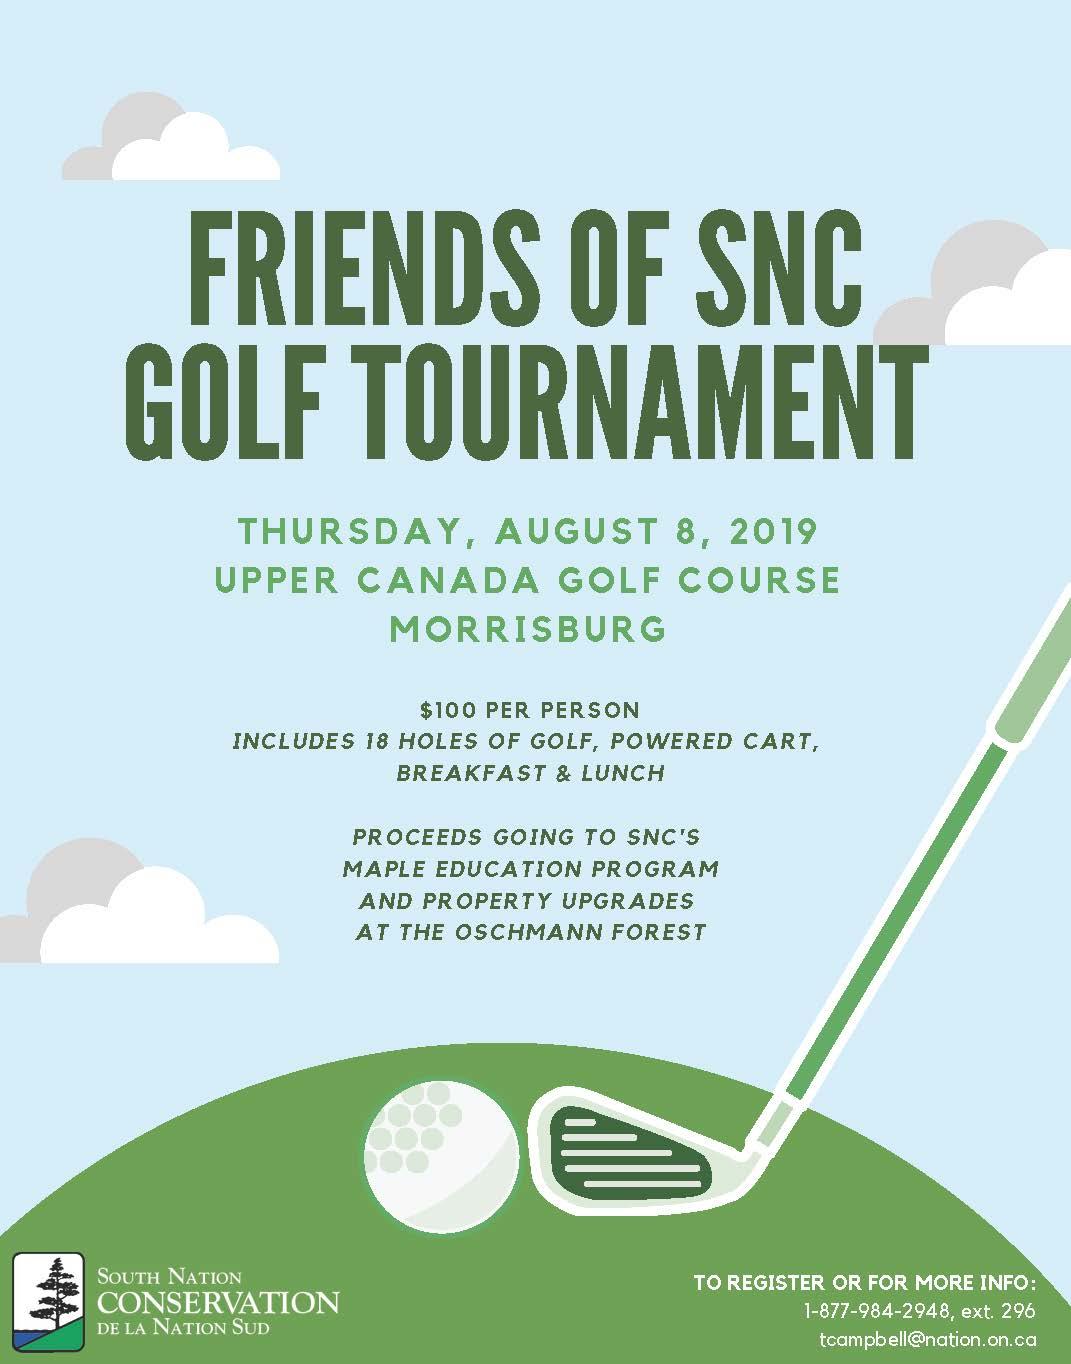 Friends of SNC Golf Tournament @ Upper Canada Golf Course | Morrisburg | Ontario | Canada